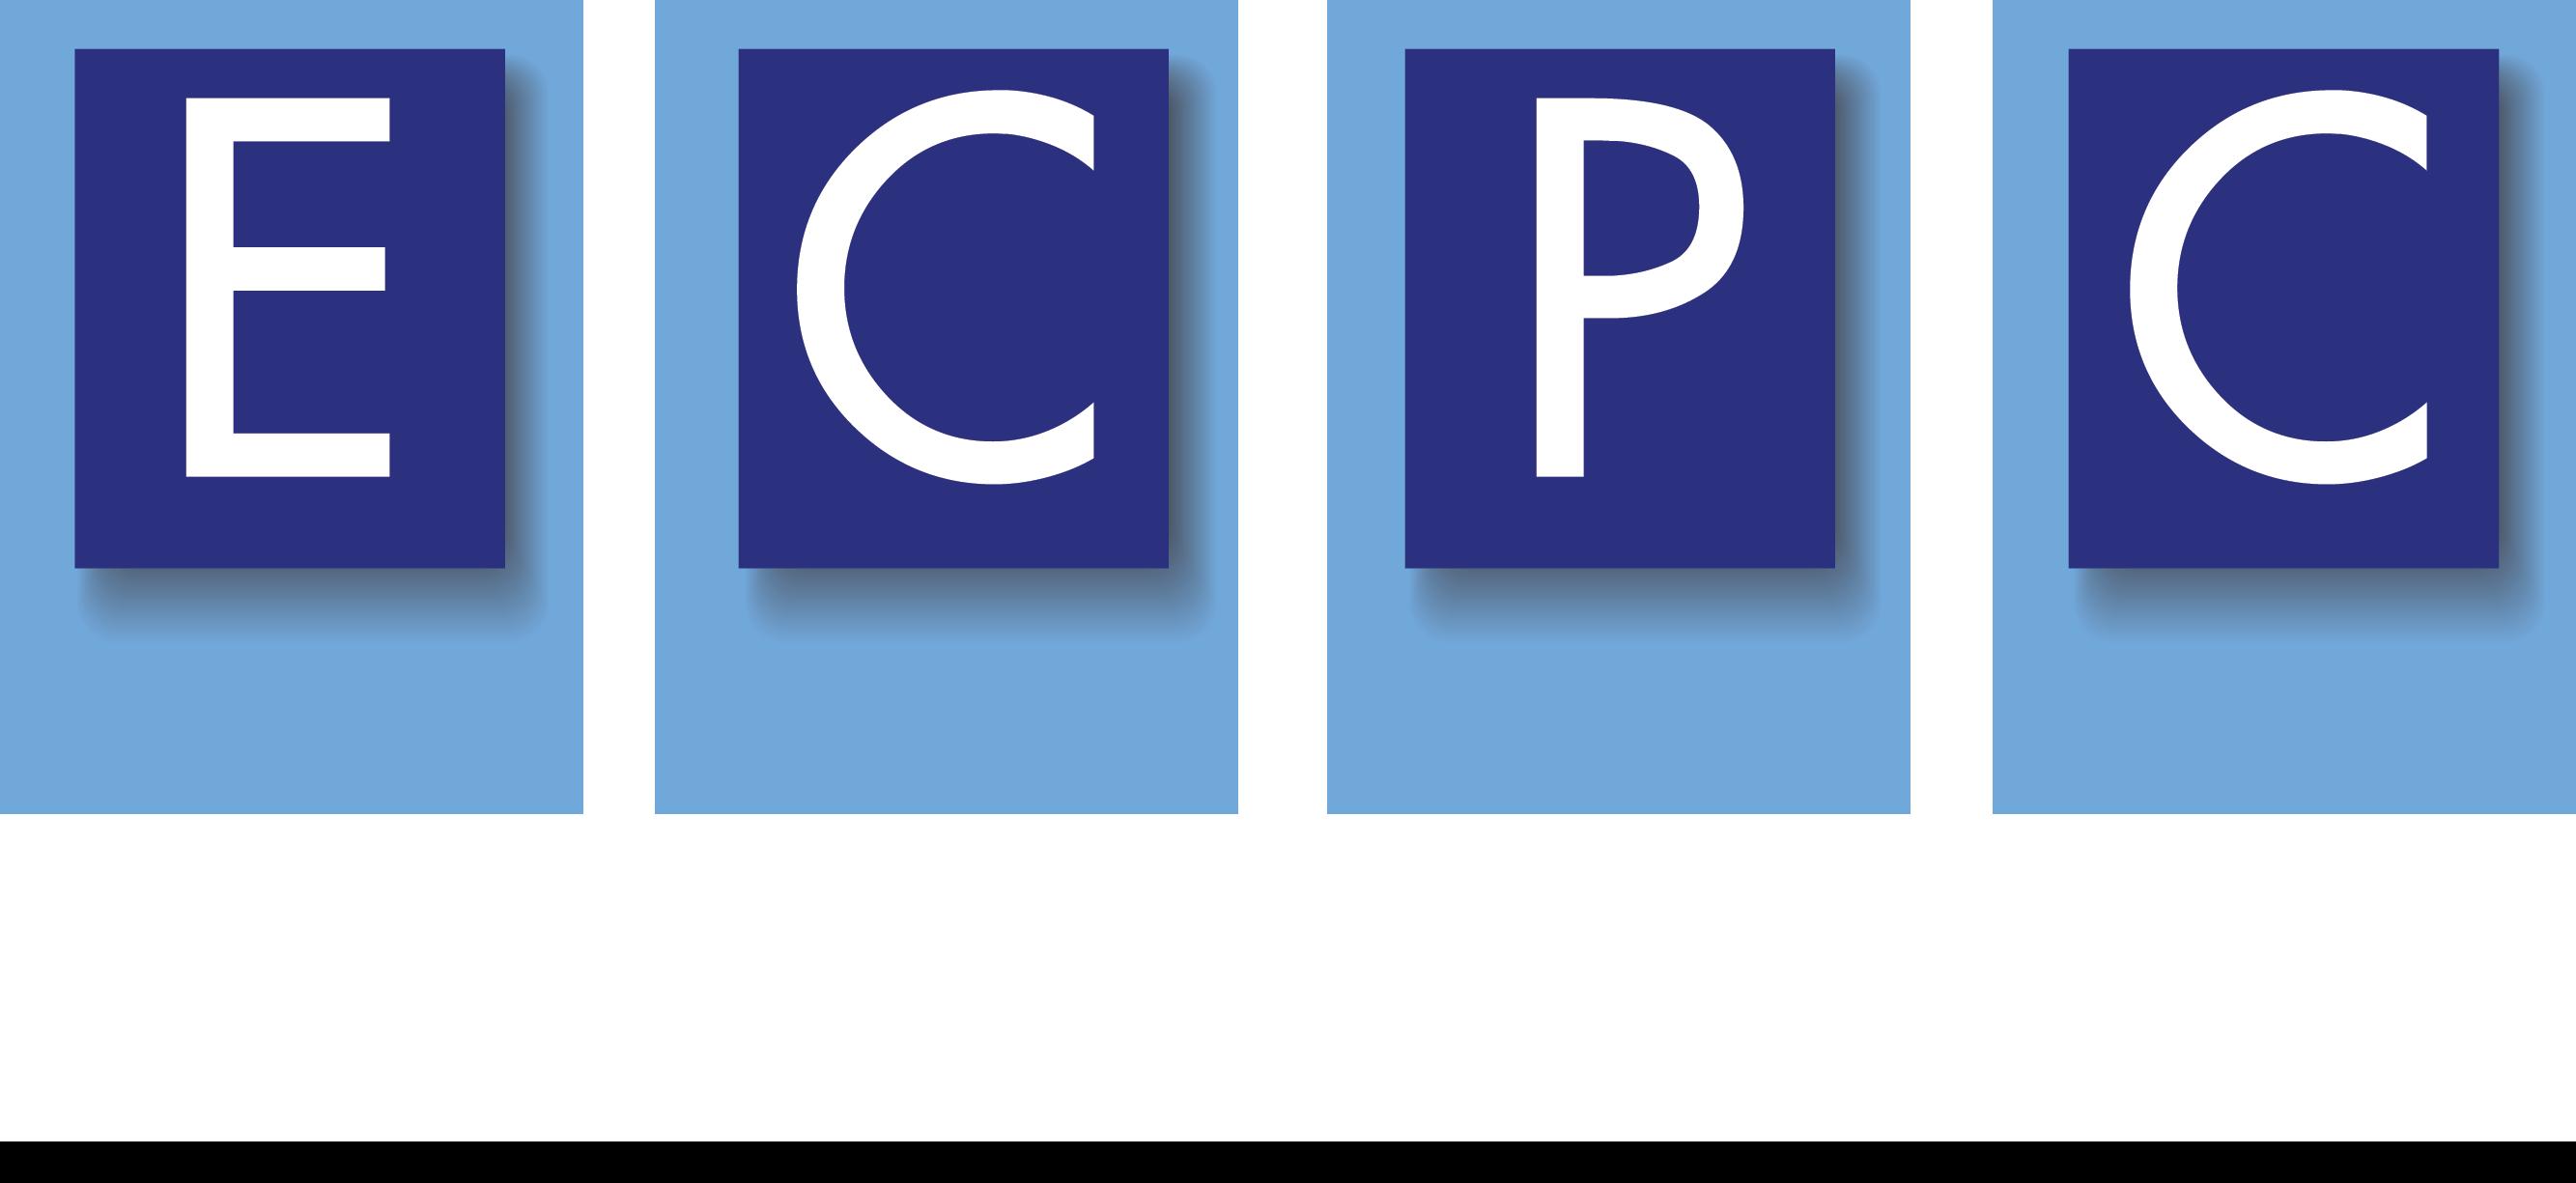 ecpc logo